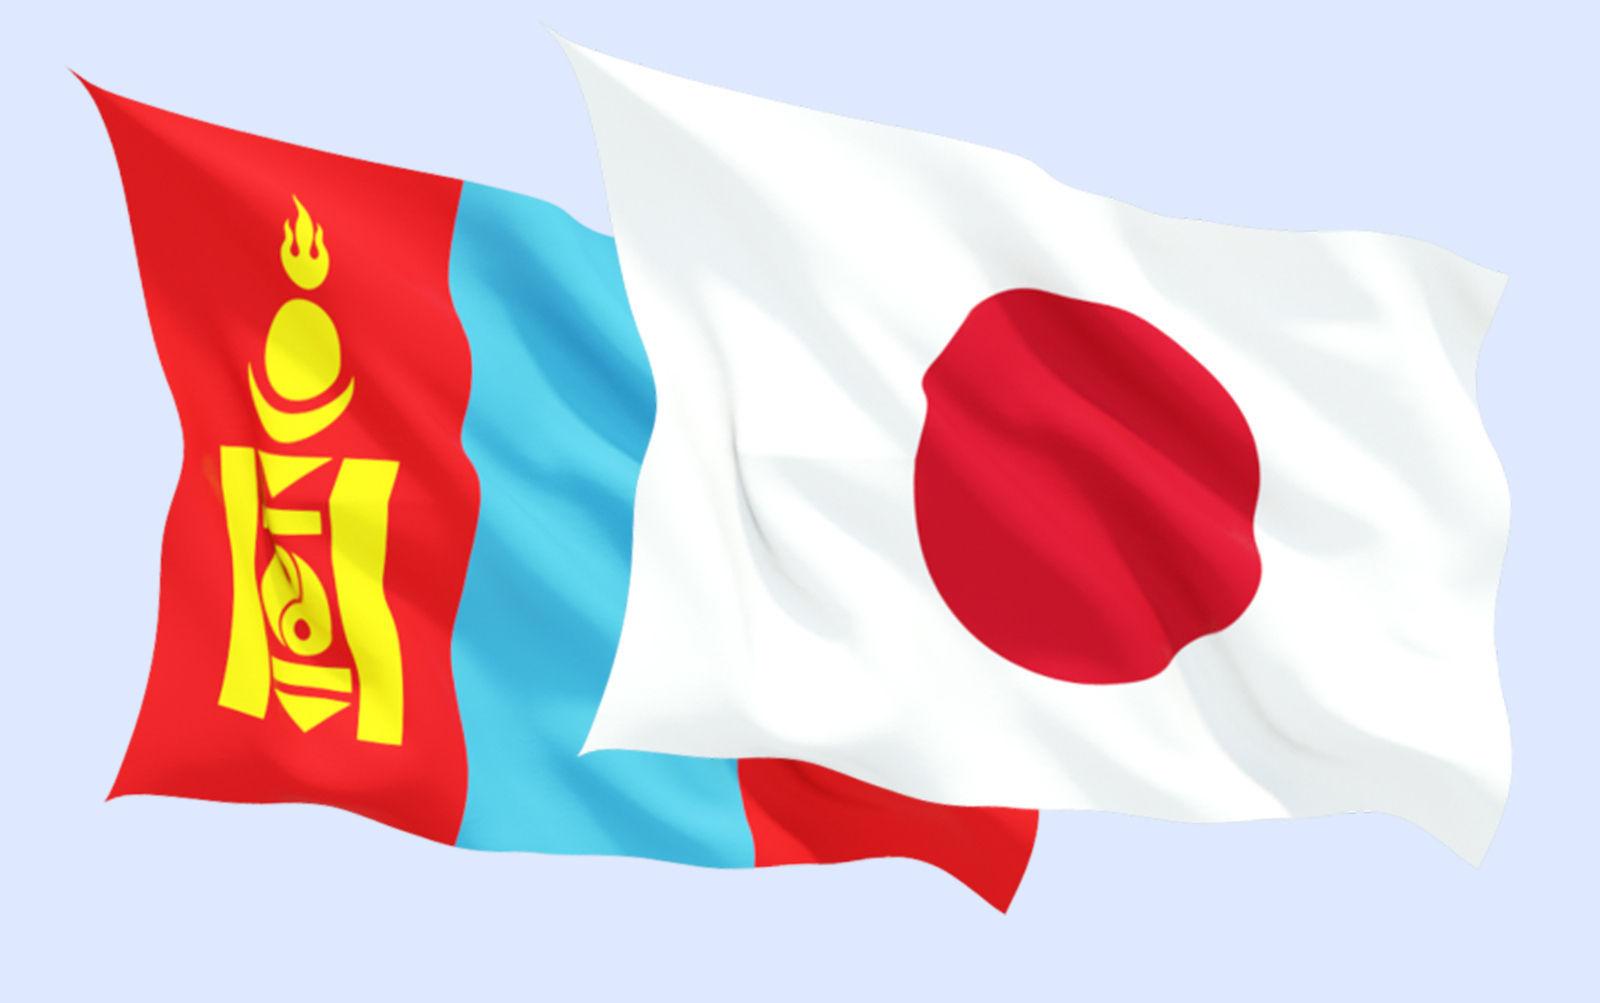 Япон, Монгол даргын ялгаа